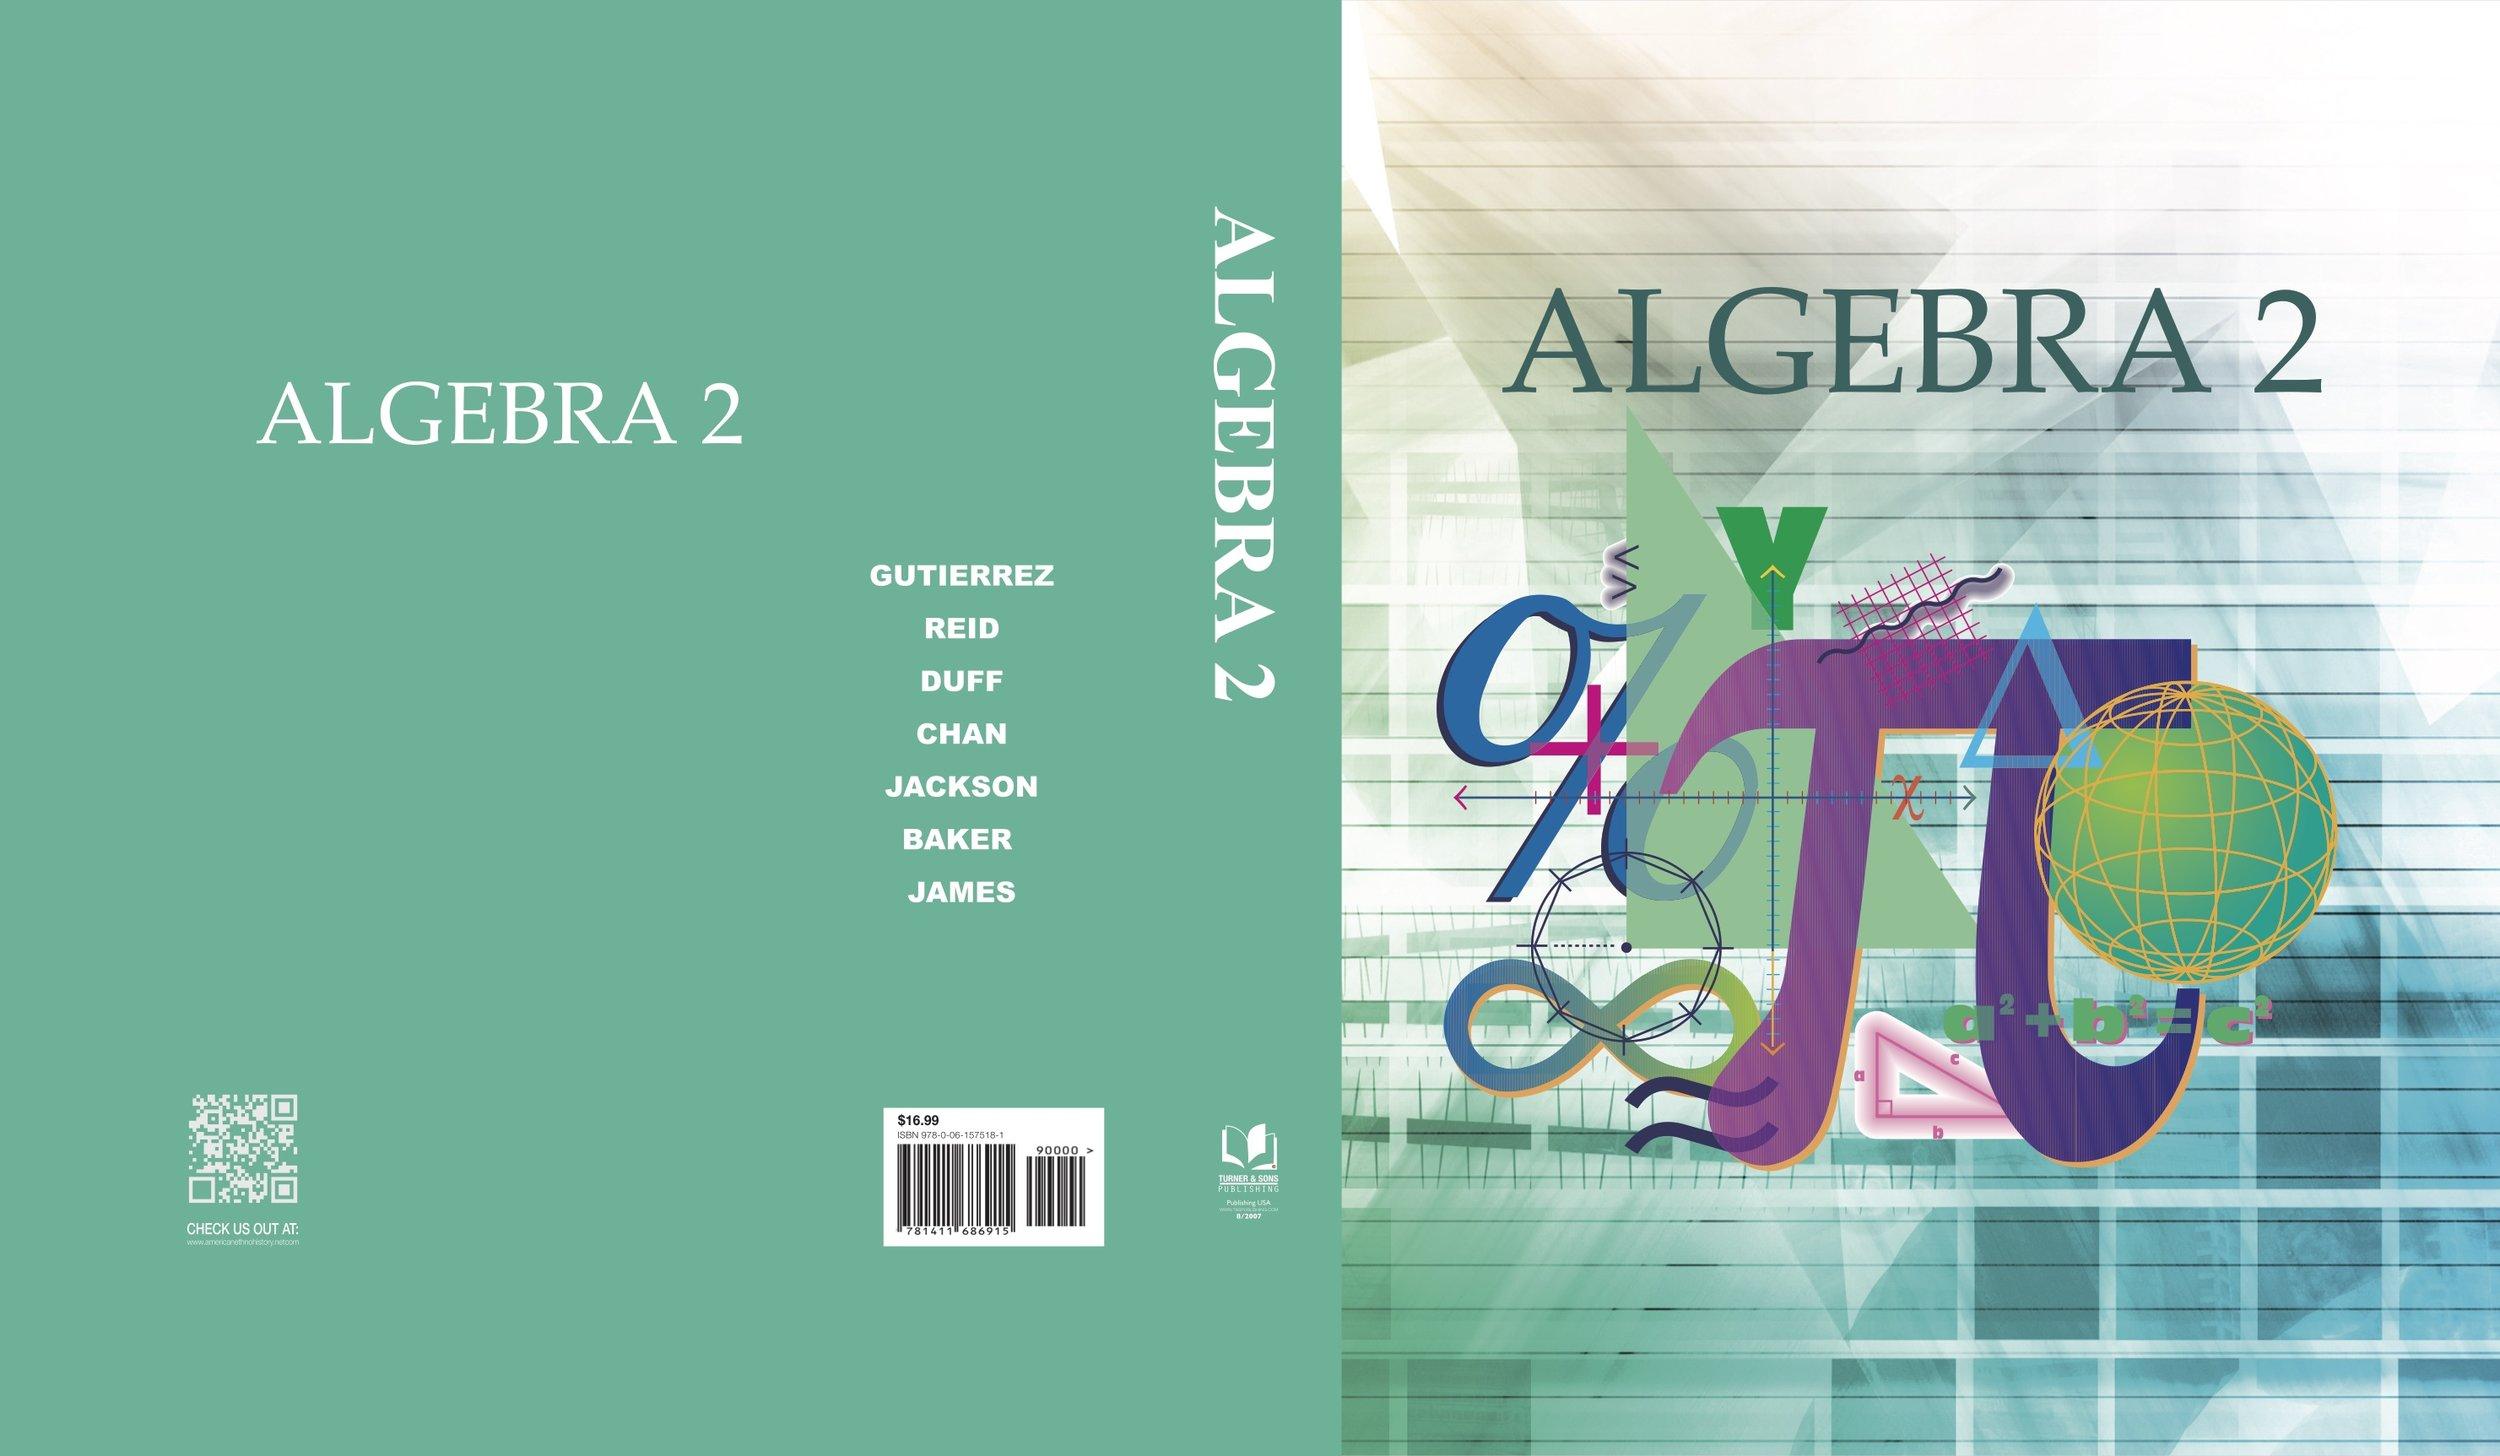 FL1_Textbooks1c.jpg